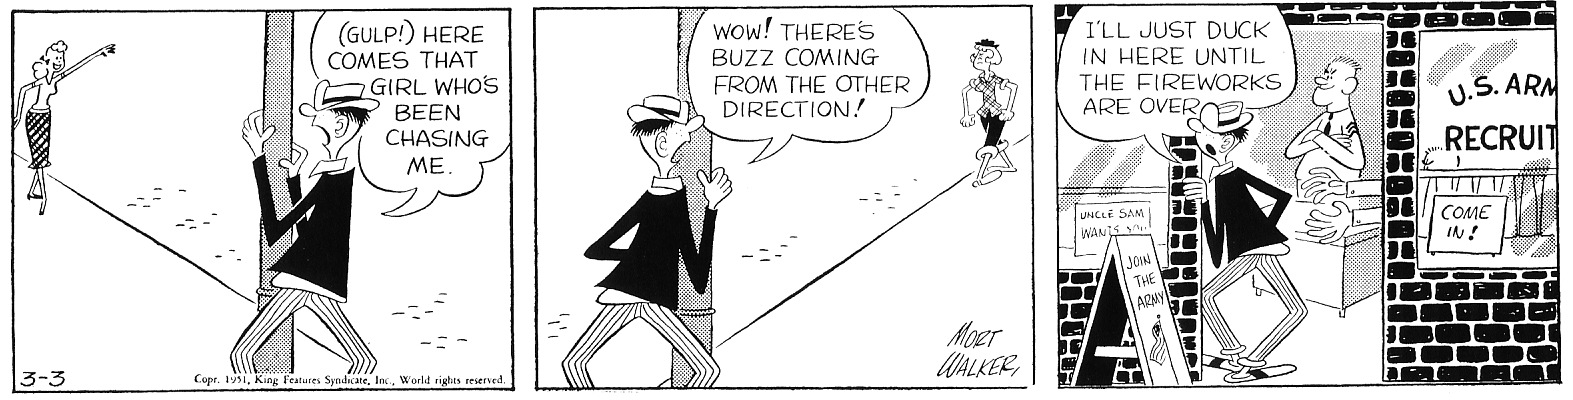 1951.3.3